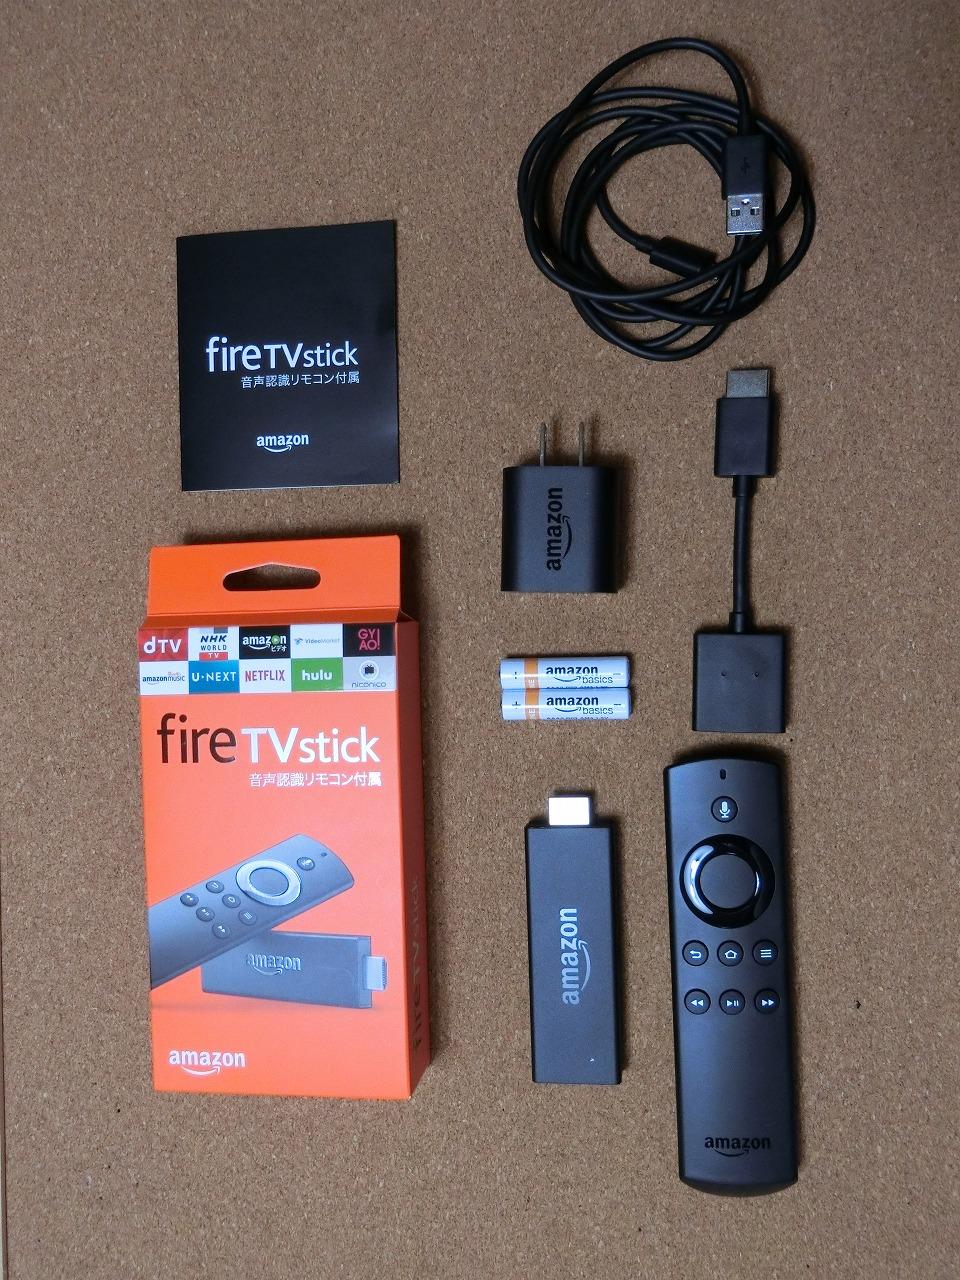 Fire_tv_stick_2s